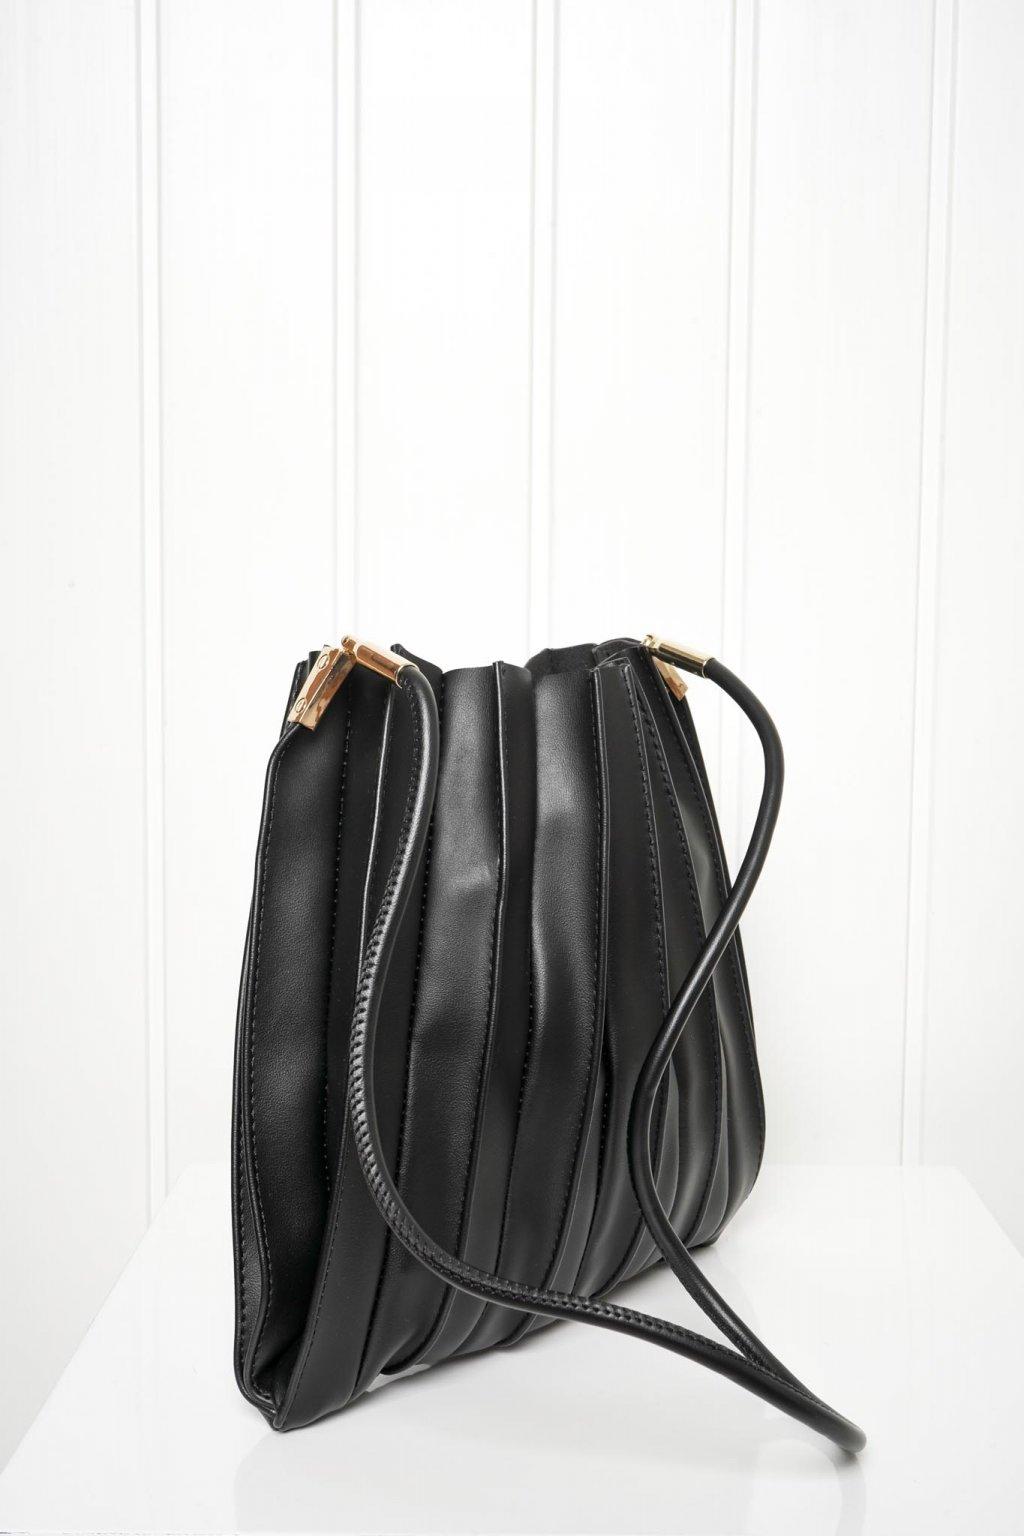 Kabelka, crossbody, ruksak, shopping bag, shopperka, 078